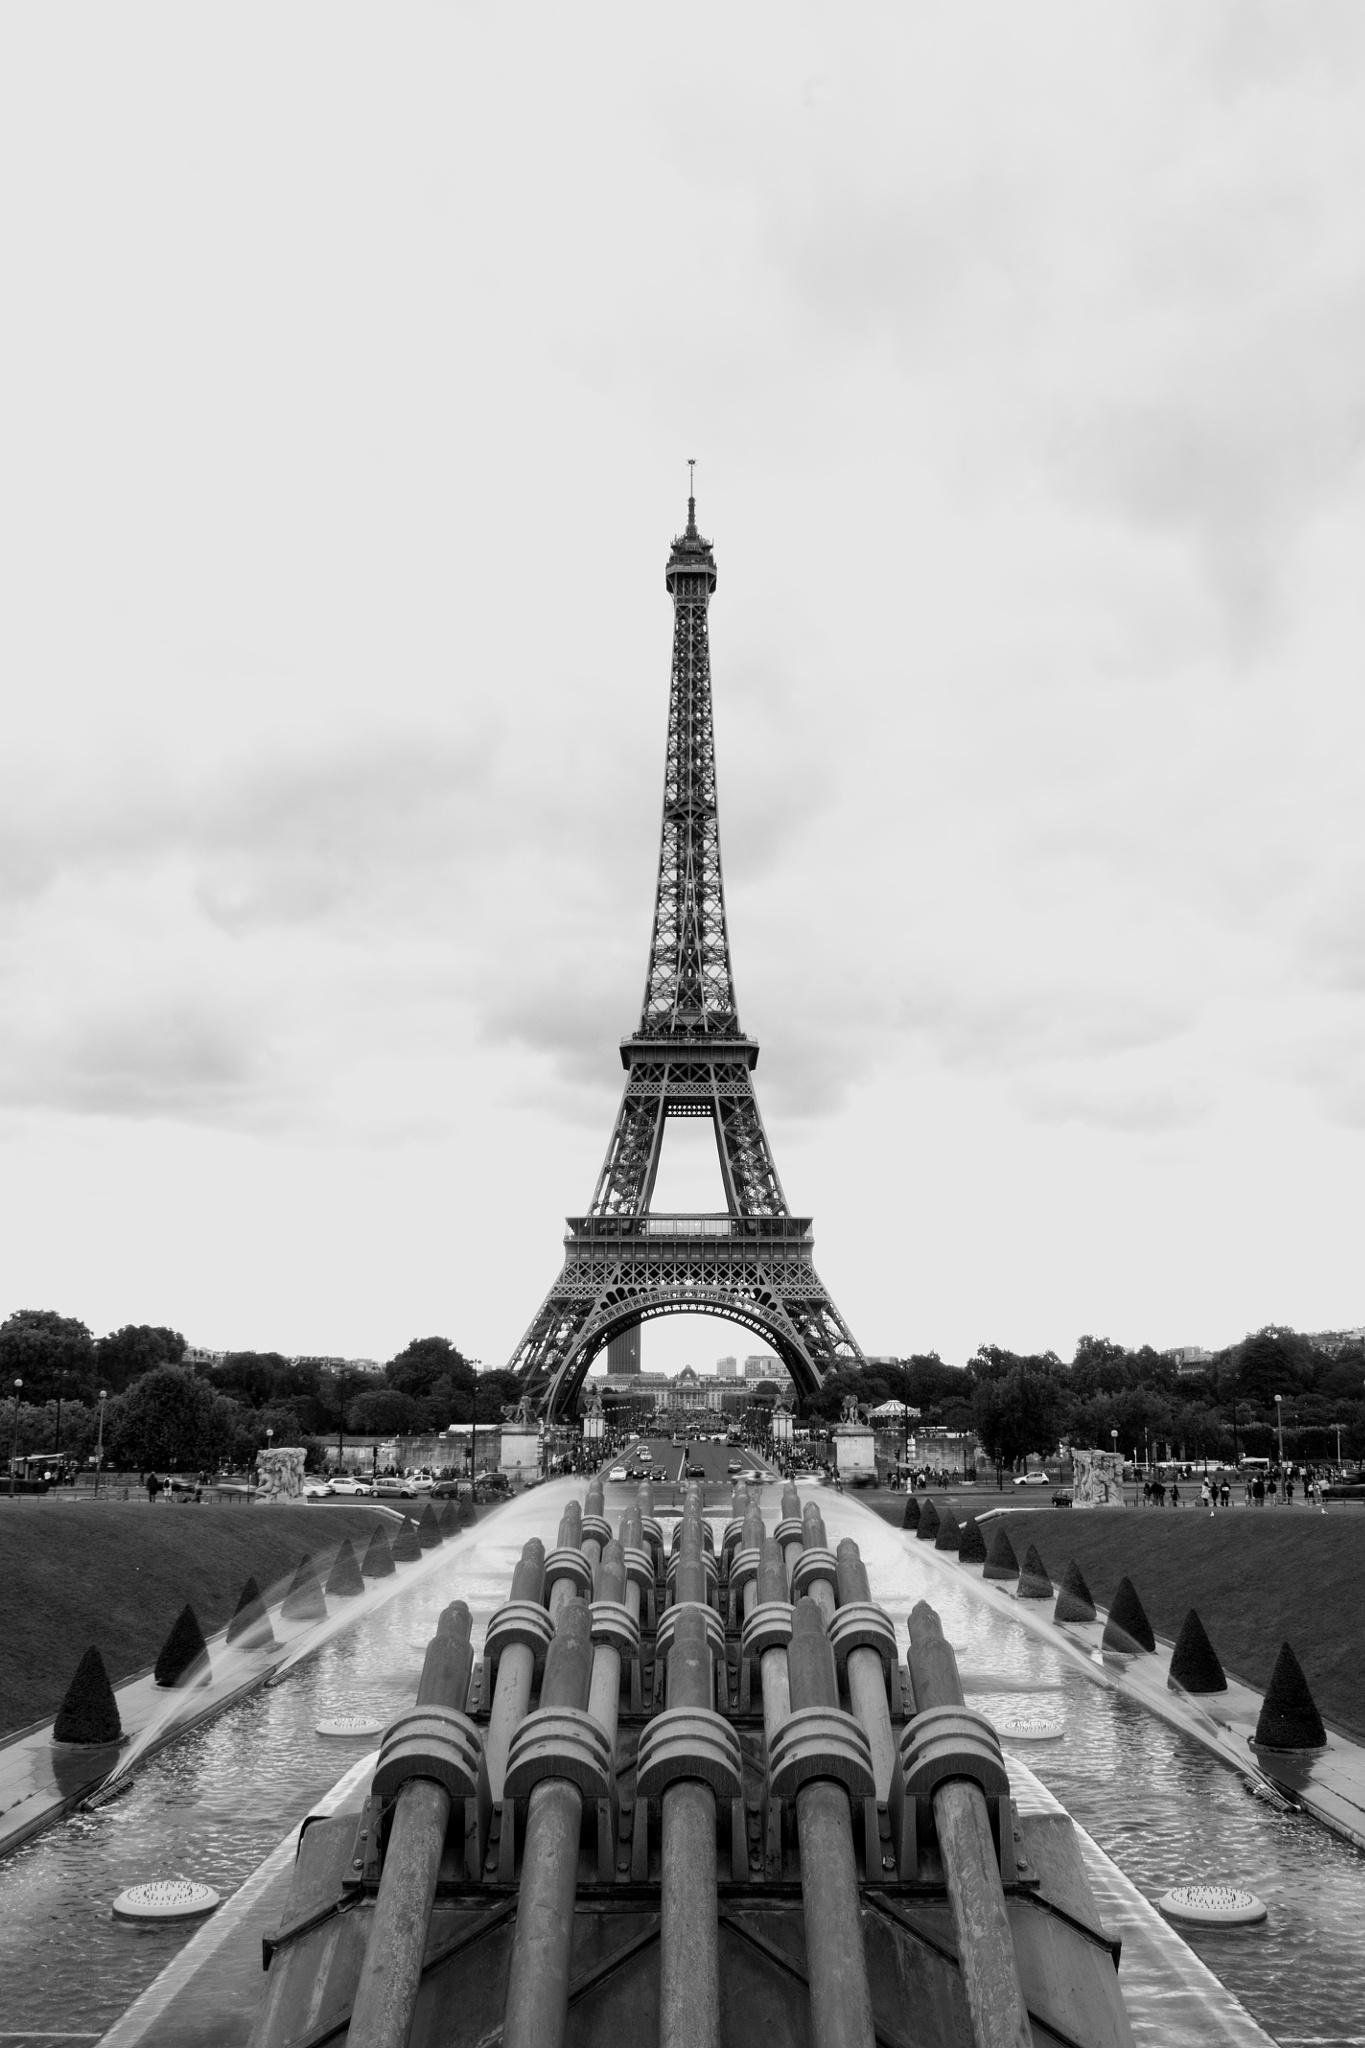 Paris Eifelturm by Freihandfotografie Wuppertal